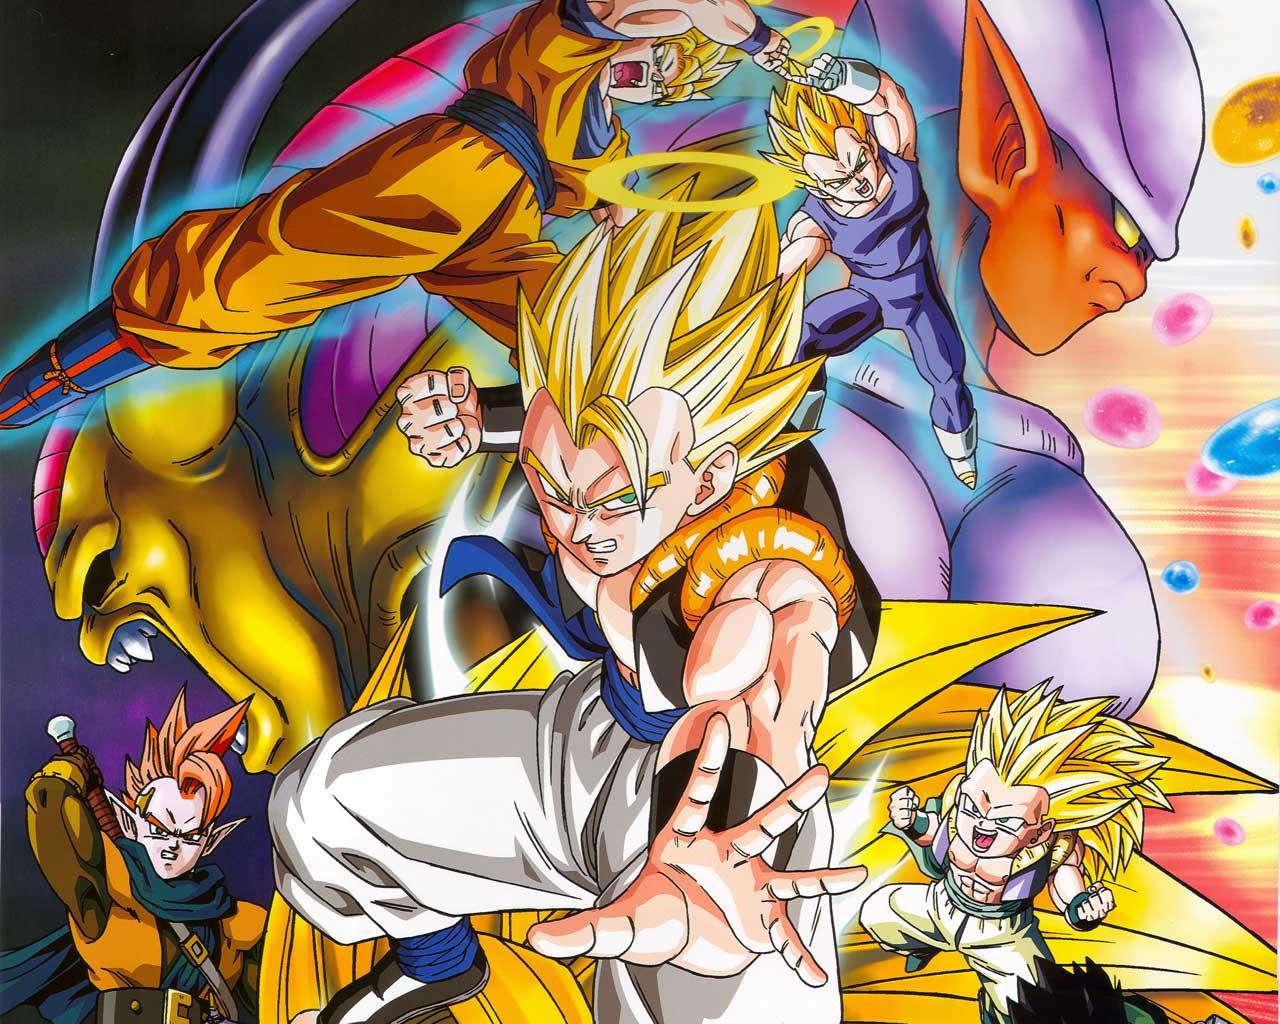 Dragon Ball Z De 1314 Hd Wallpapers in Cartoons Imagesci 1280x1024